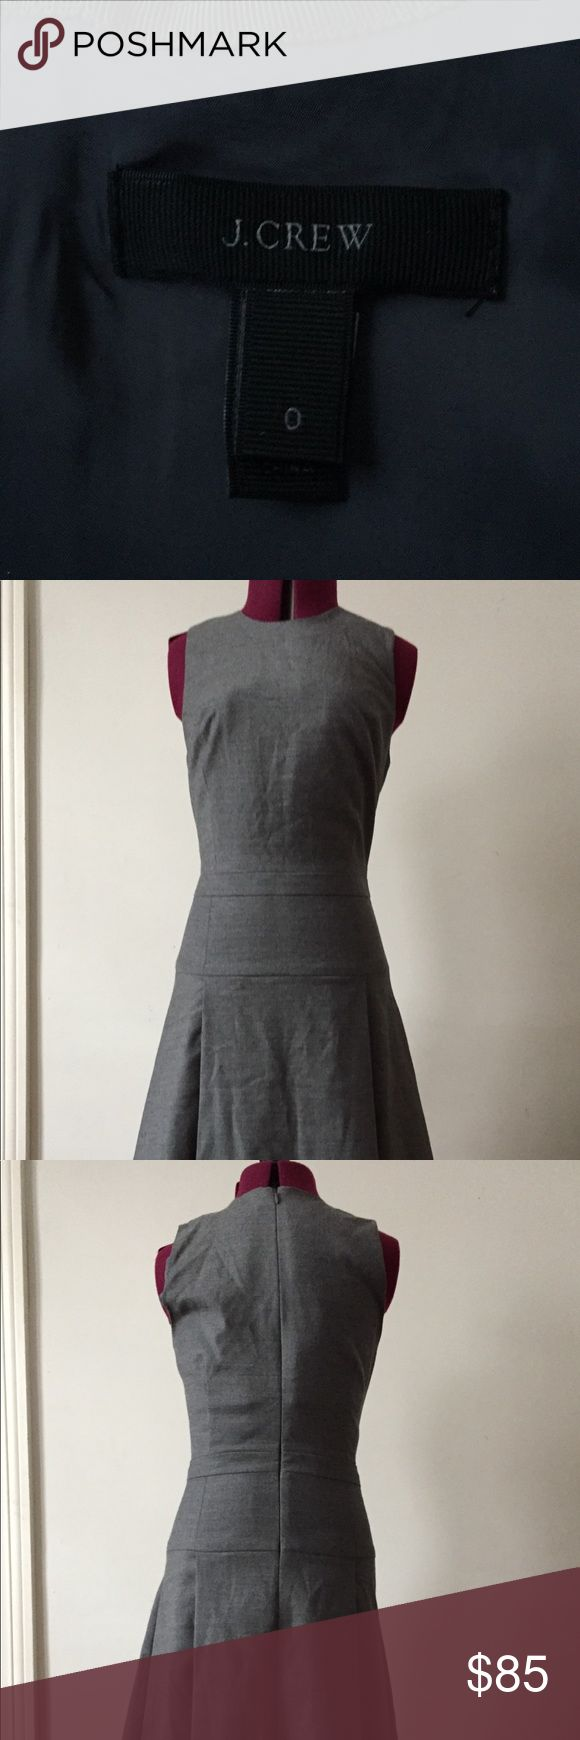 I just added this listing on Poshmark: J Crew gray sleeveless dress. #shopmycloset #poshmark #fashion #shopping #style #forsale #J. Crew #Dresses & Skirts